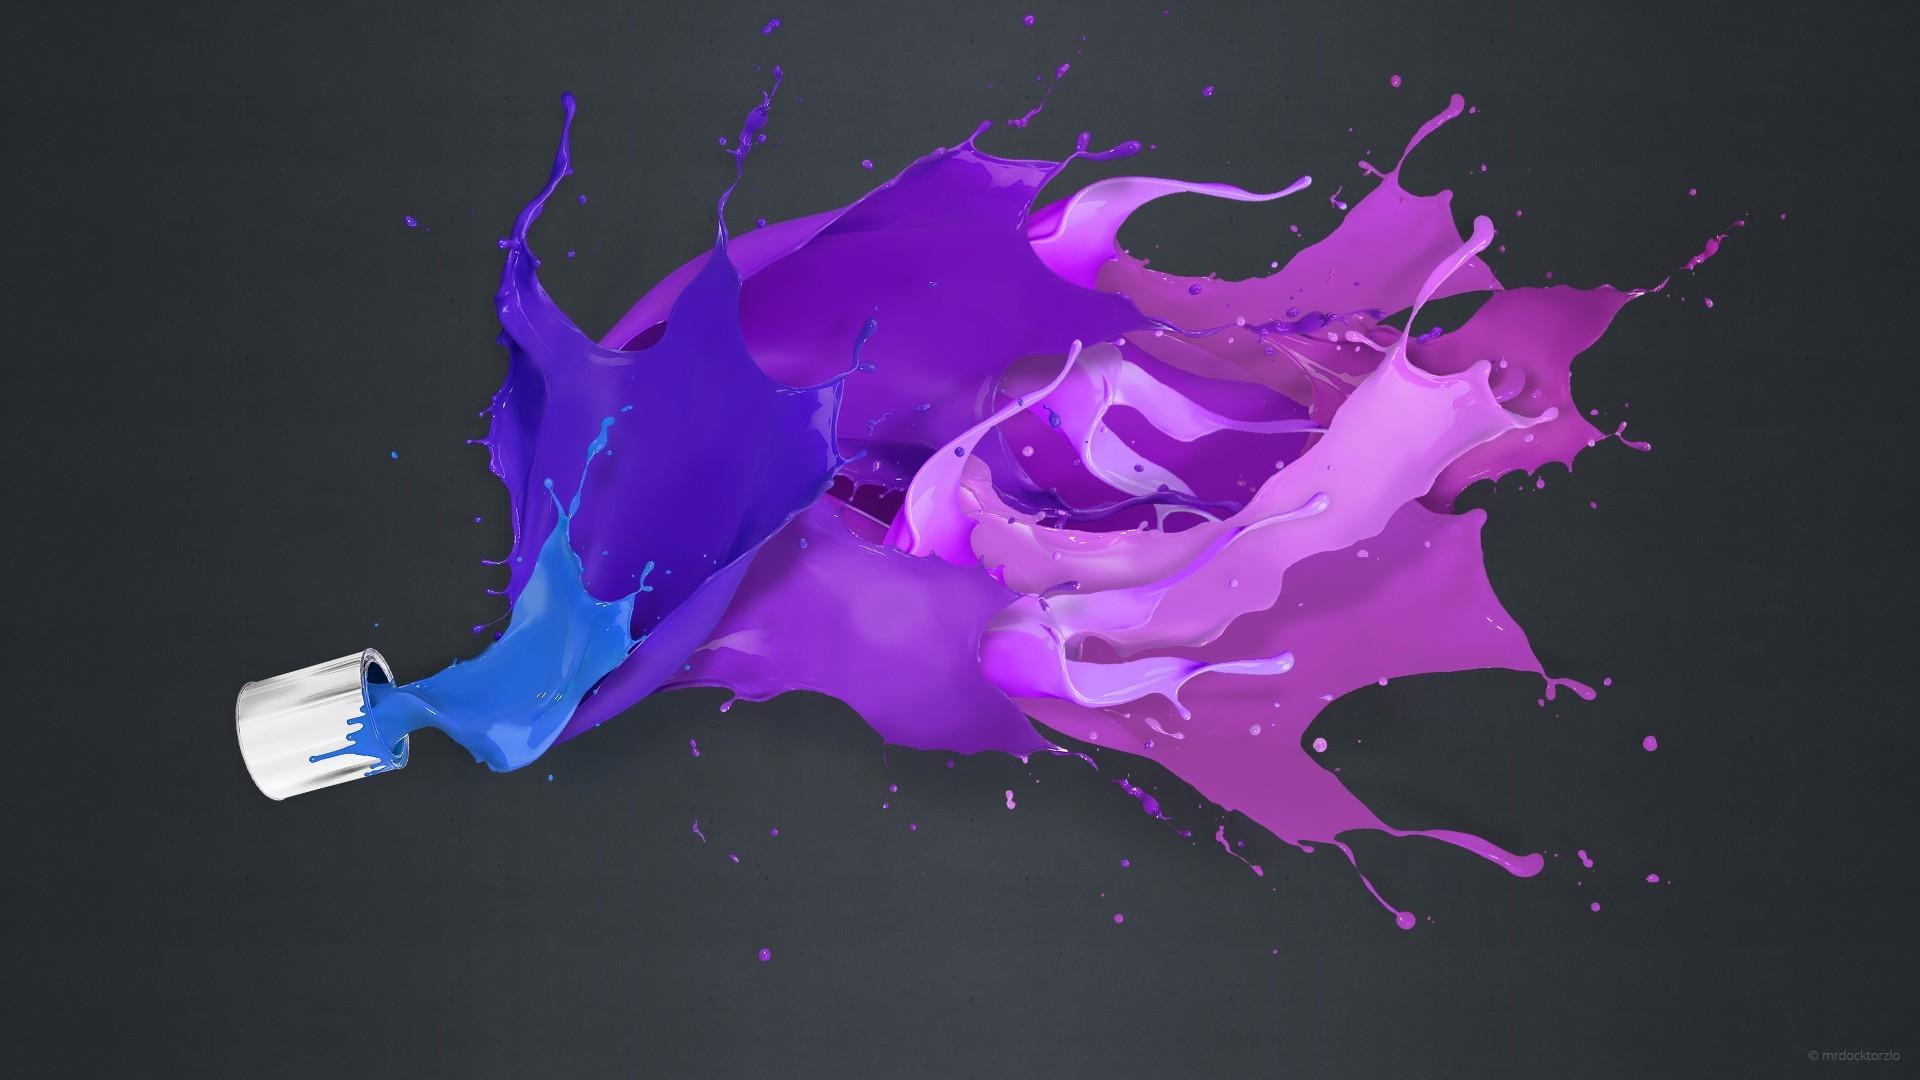 Paint color splash background wallpaper 1920x1080 for Color splash wall art